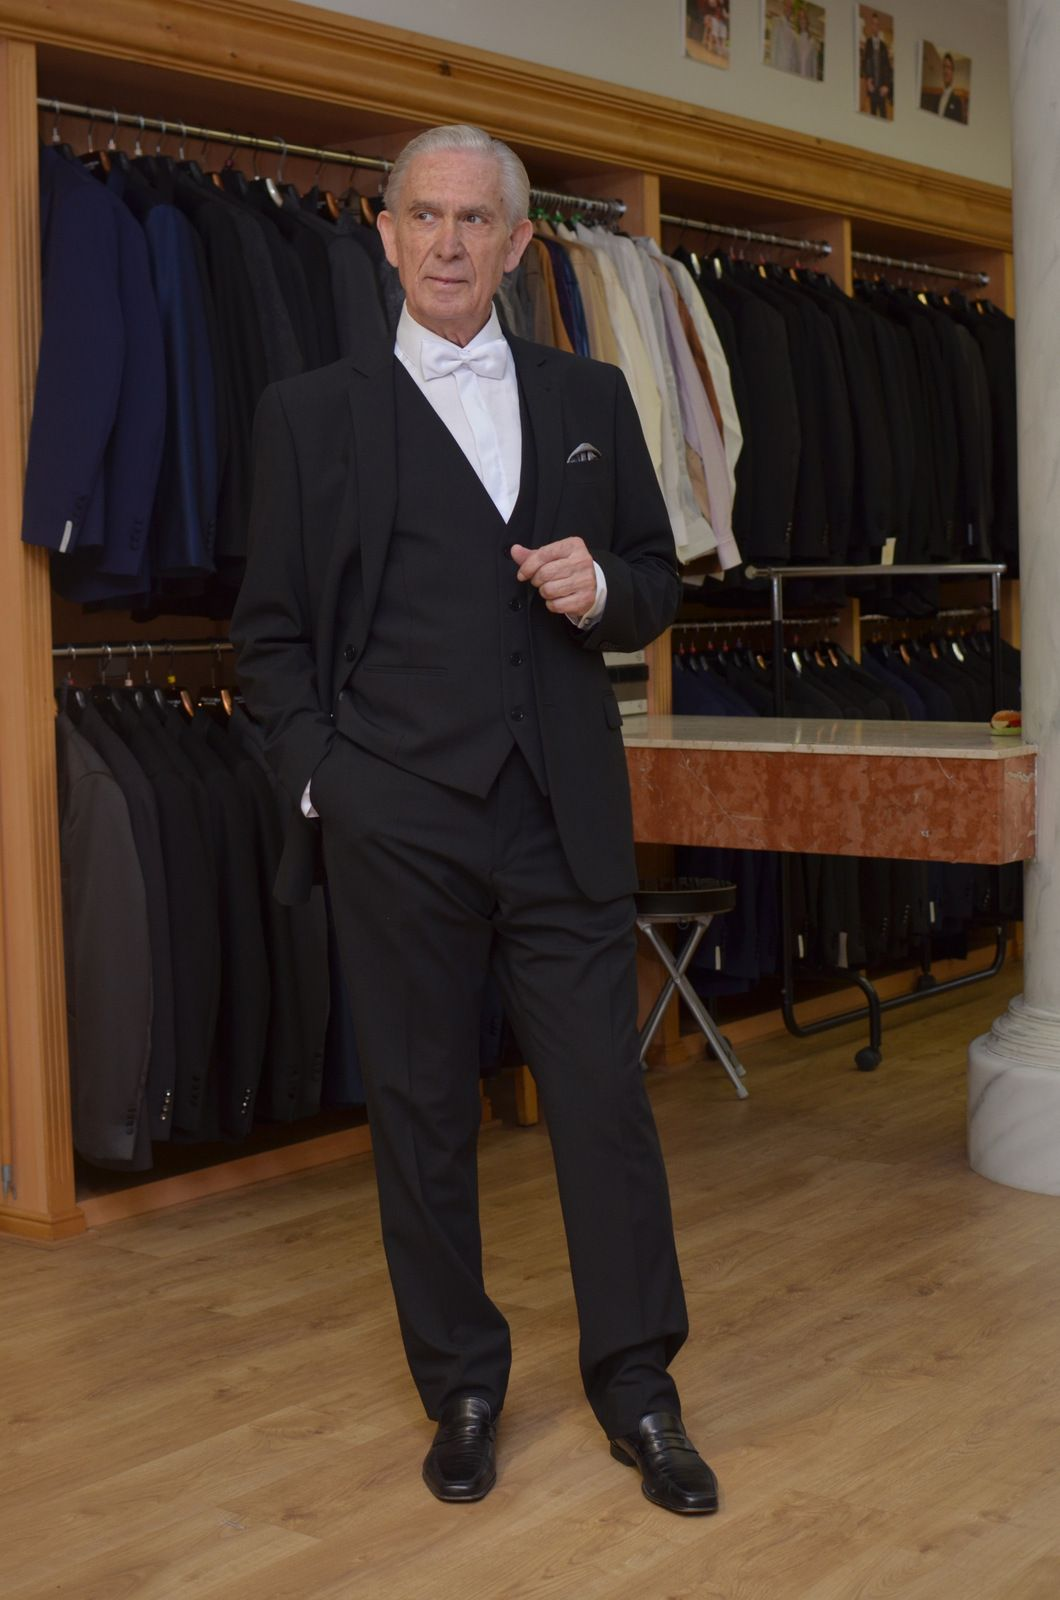 b33915f7b Traje de gala negro para padrino, rico lana con pajarita blanca, etiqueta  pura.